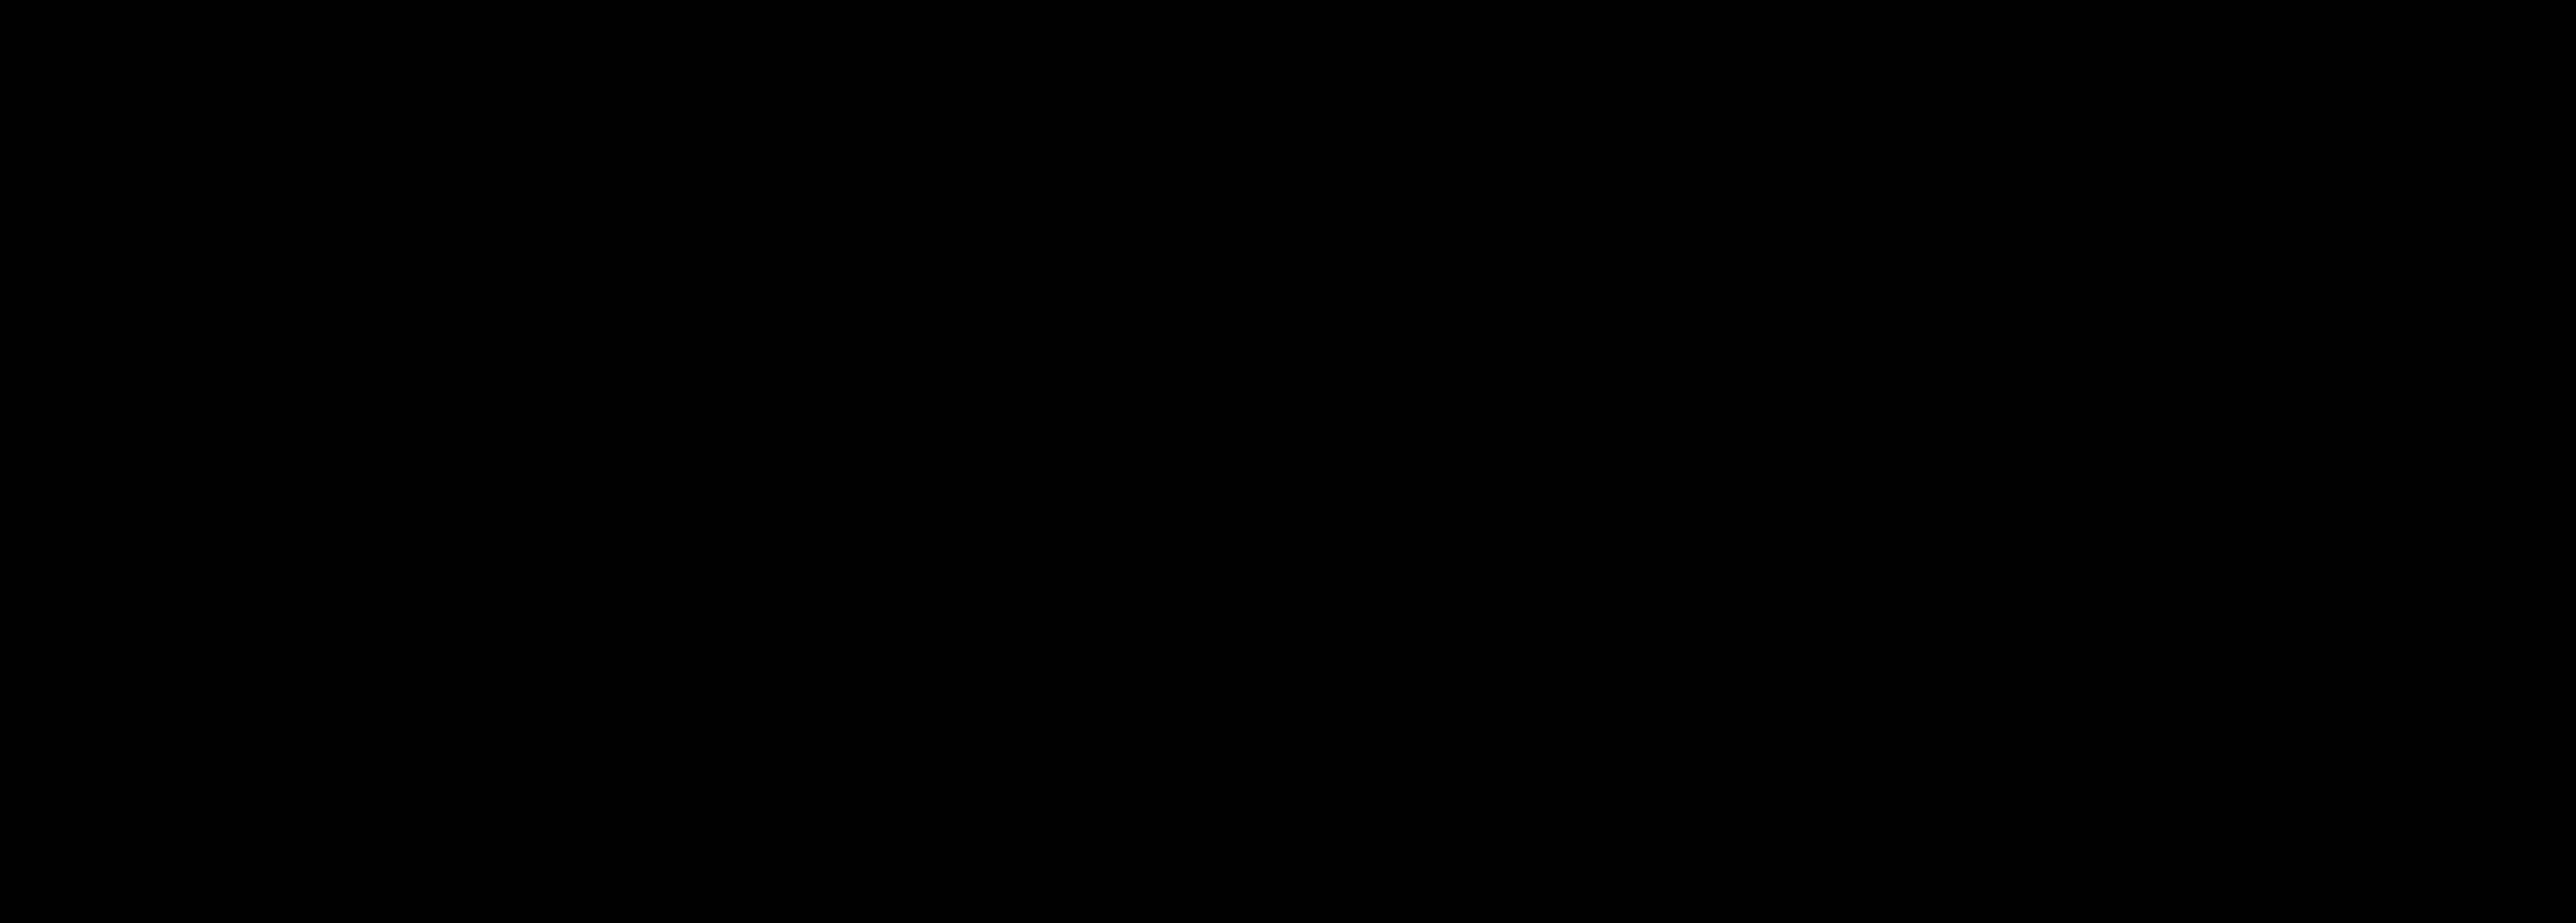 Chevrolet Logos Download